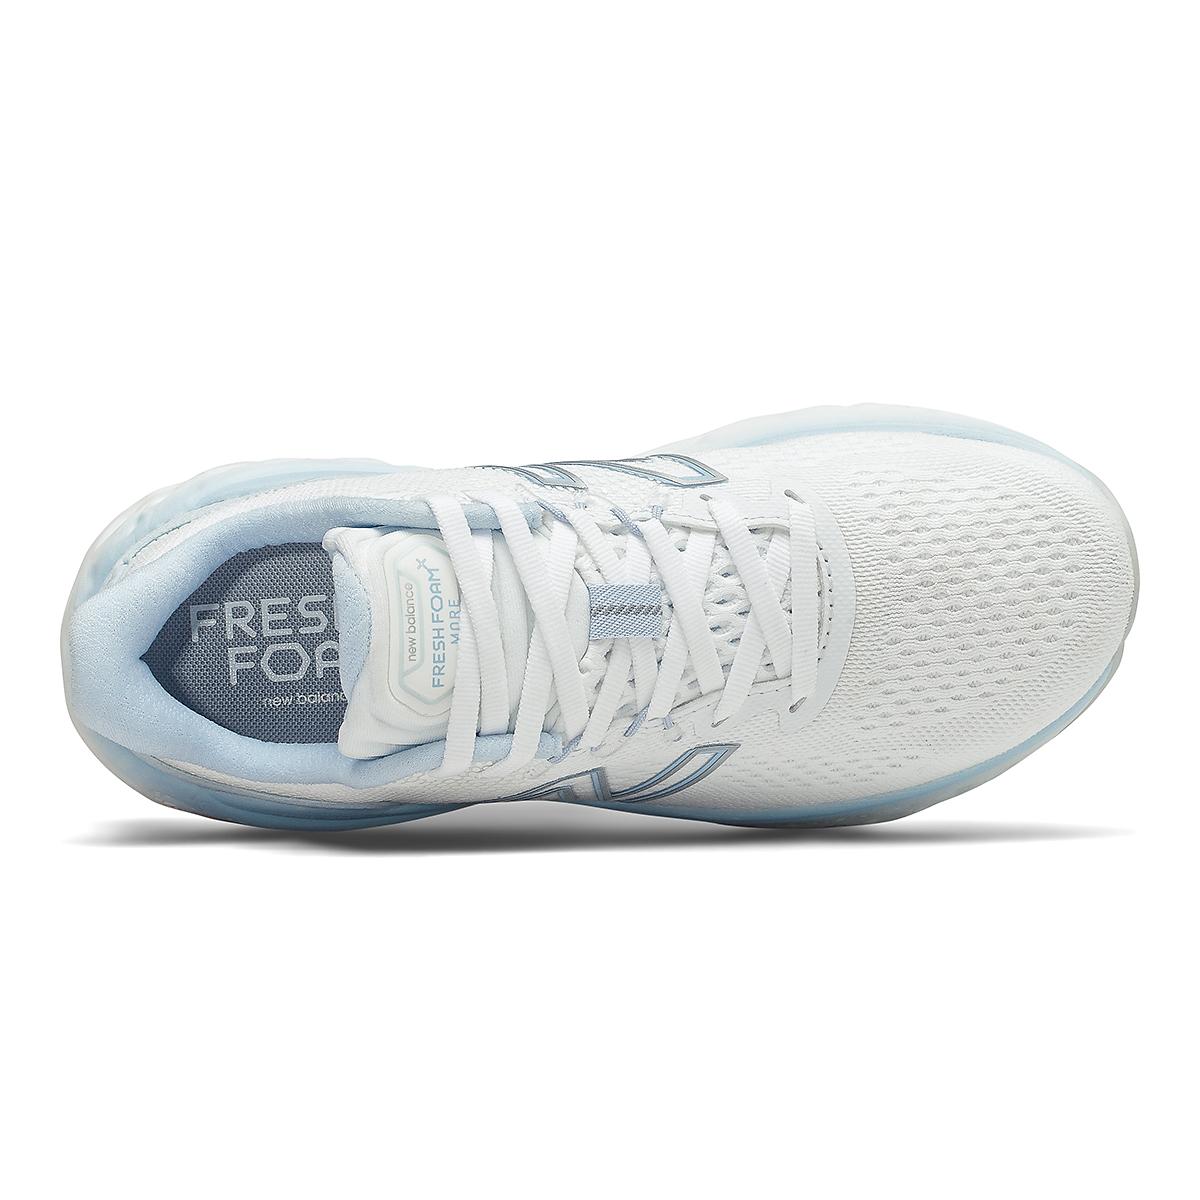 Women's New Balance More V3 Running Shoe - Color: White/Uv Glo - Size: 5 - Width: Extra Wide, White/Uv Glo, large, image 3